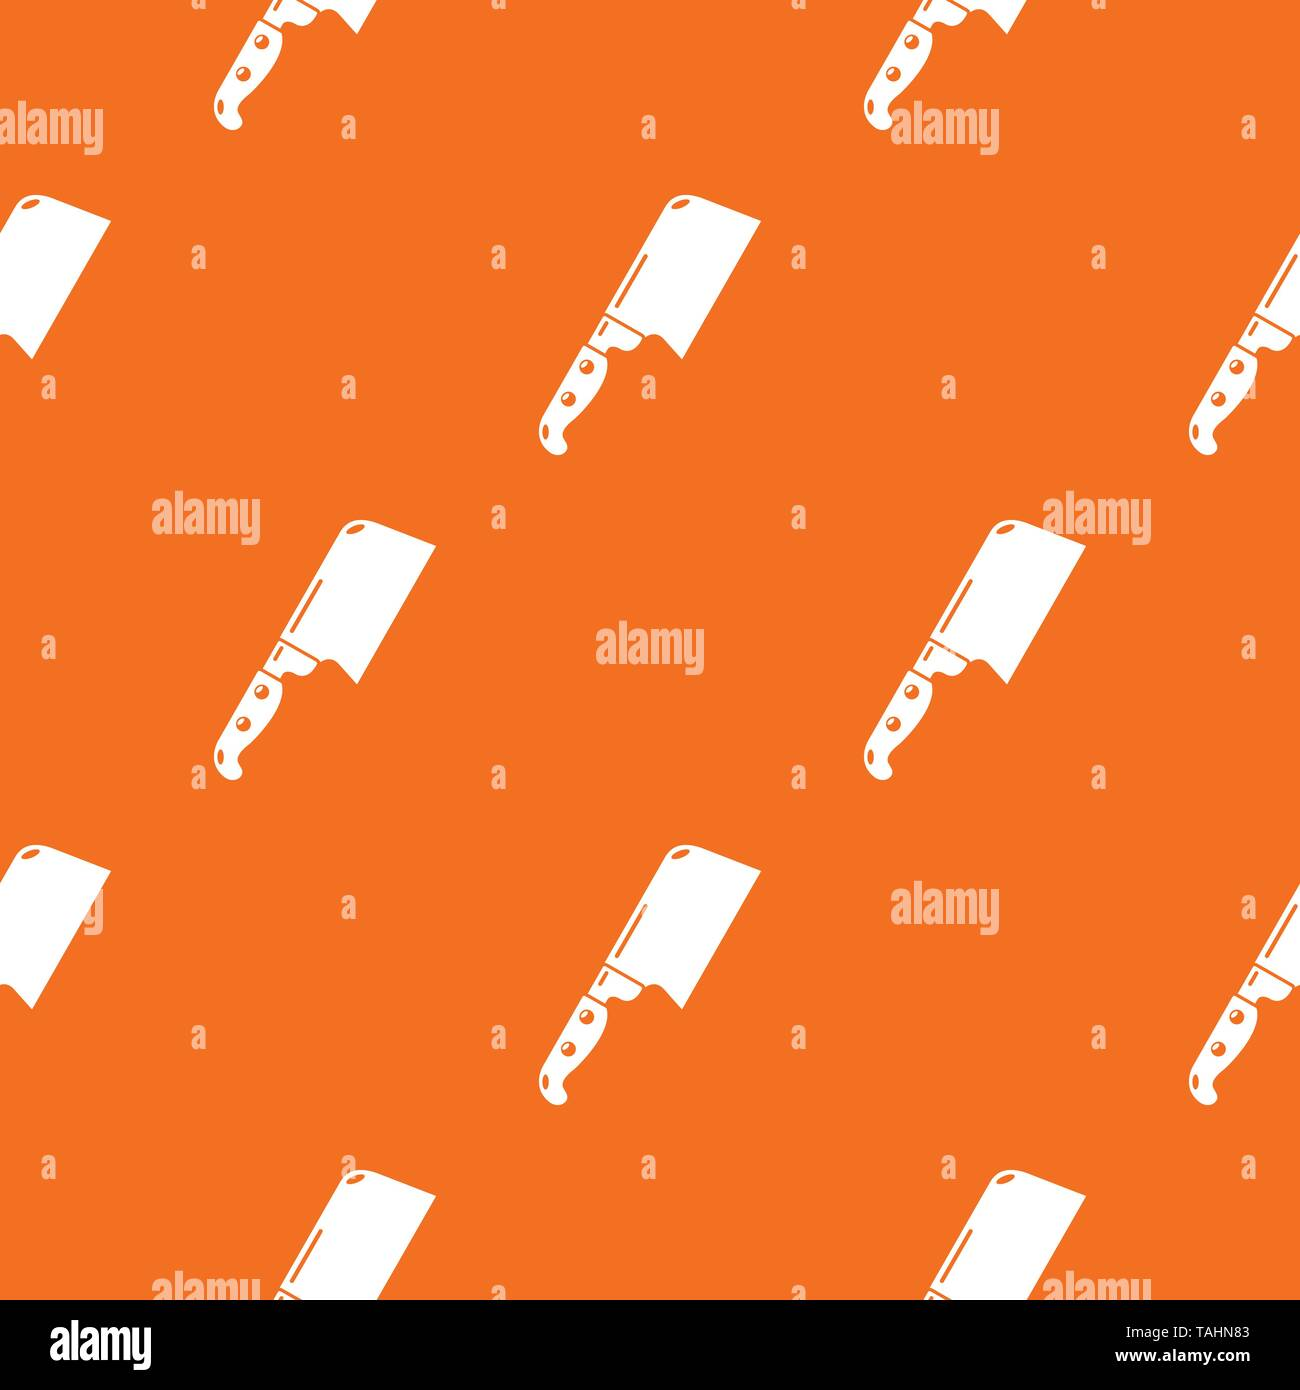 Knife meat pattern vector orange - Stock Image